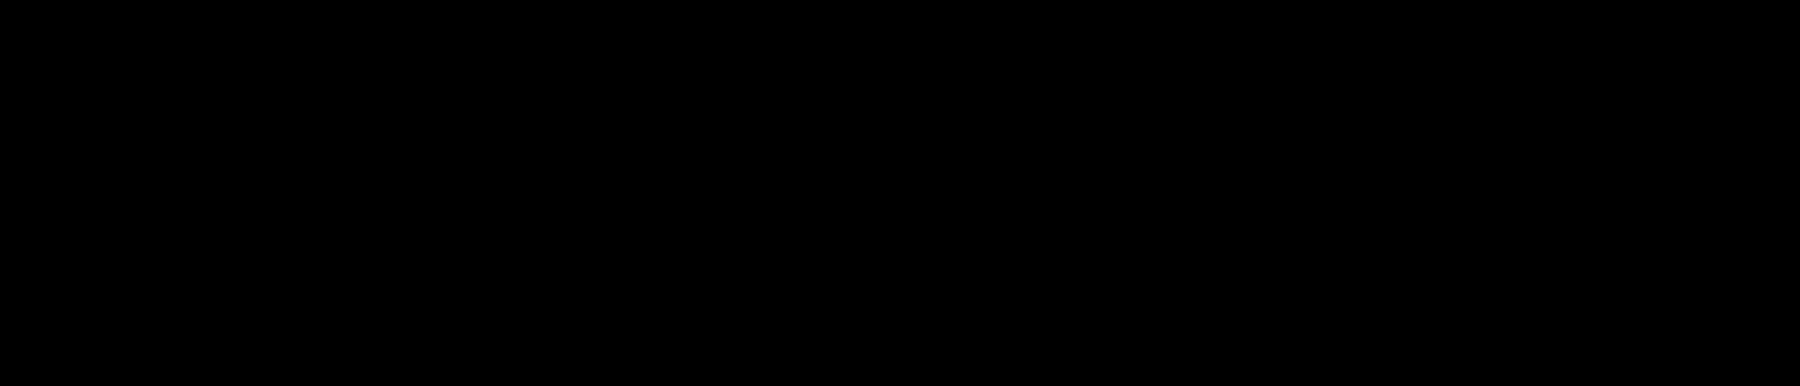 3,4-Methylenedioxyamphetamine - Wikiwand